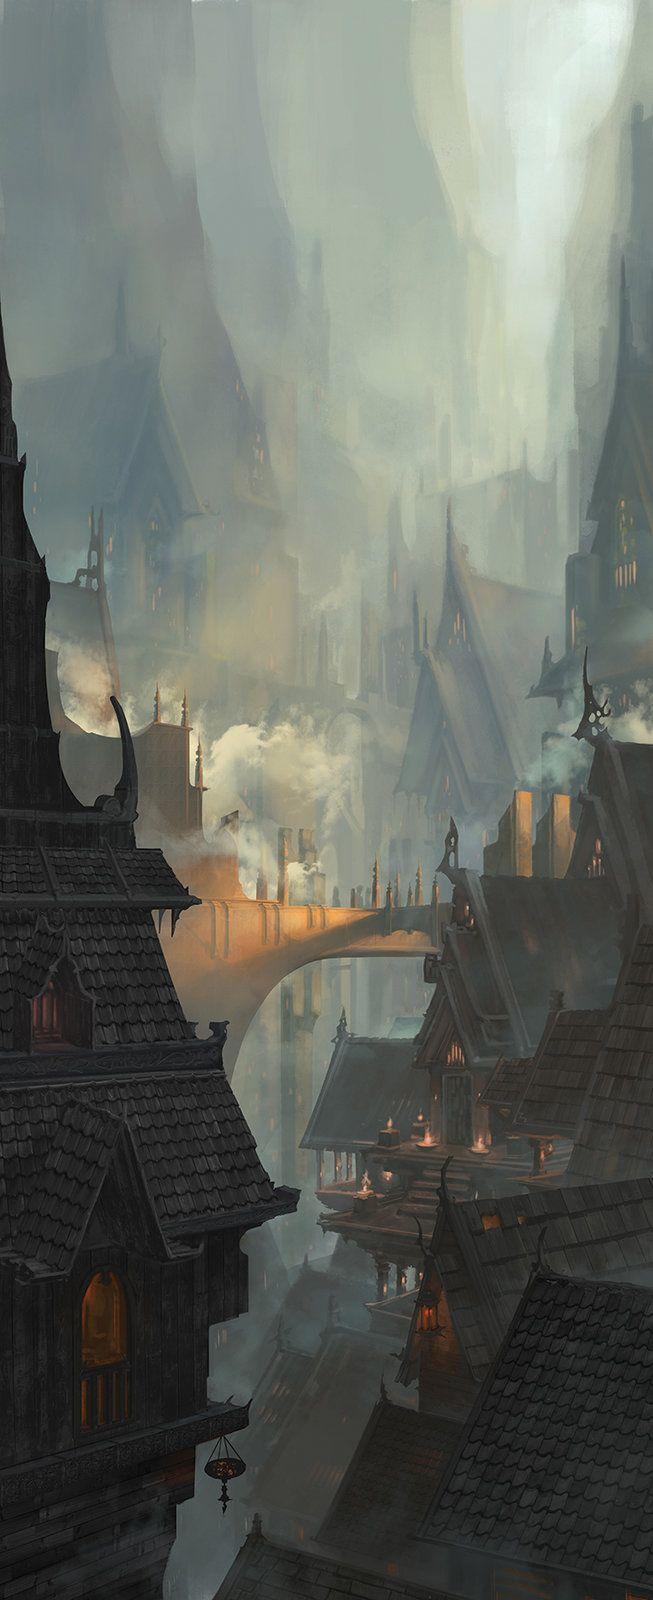 Medieval Cave City, Wilson Lin on ArtStation at https://www.artstation.com/artwork/medieval-cave-city